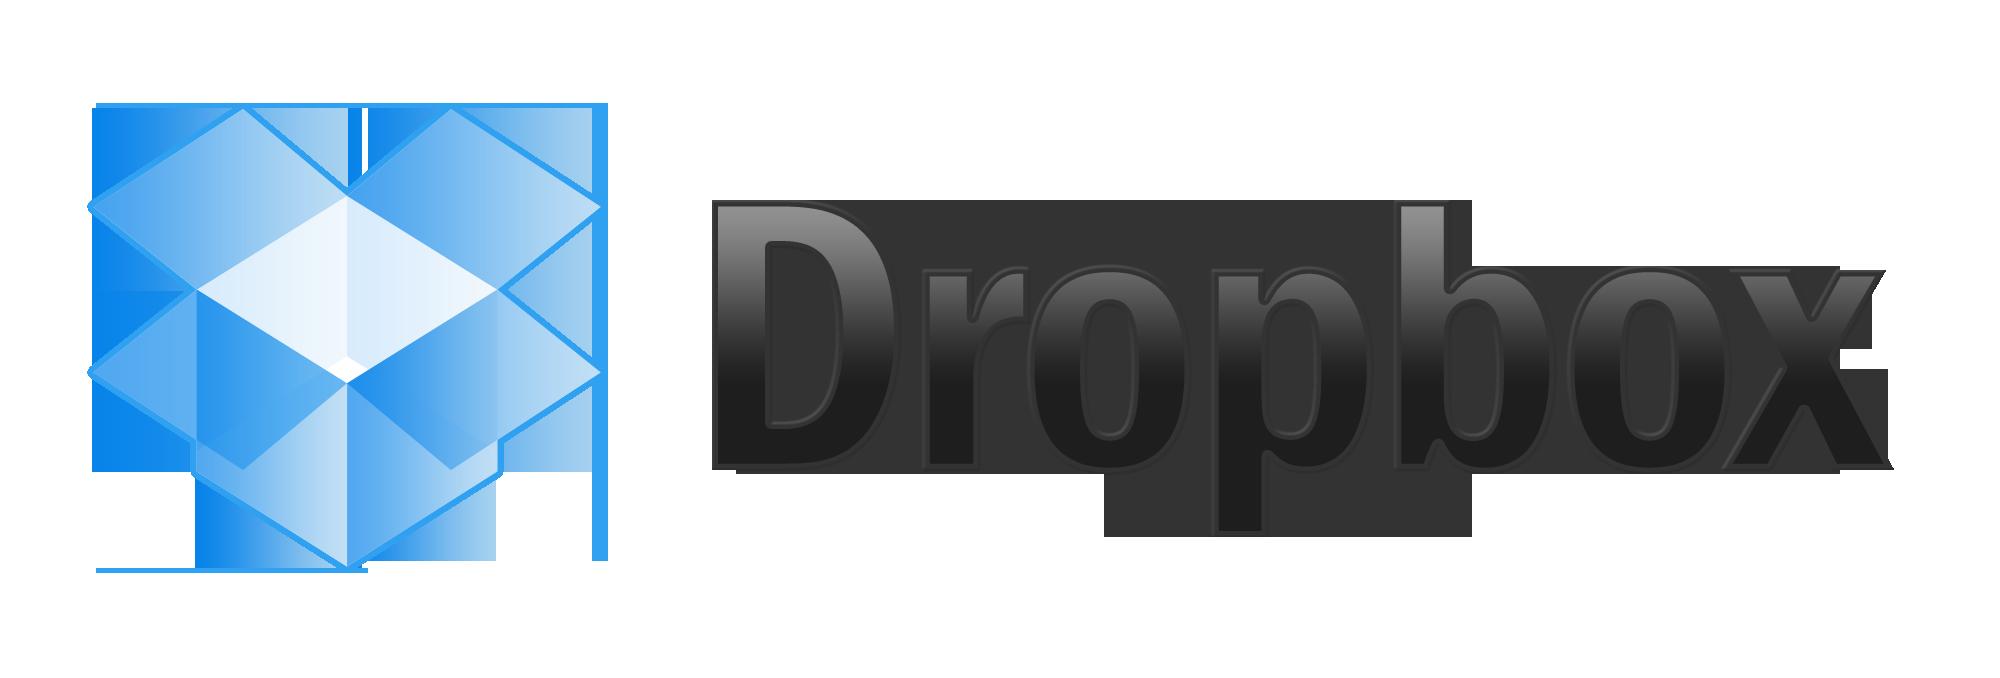 Dropbox, 2GB gratis para subir archivos! Logo